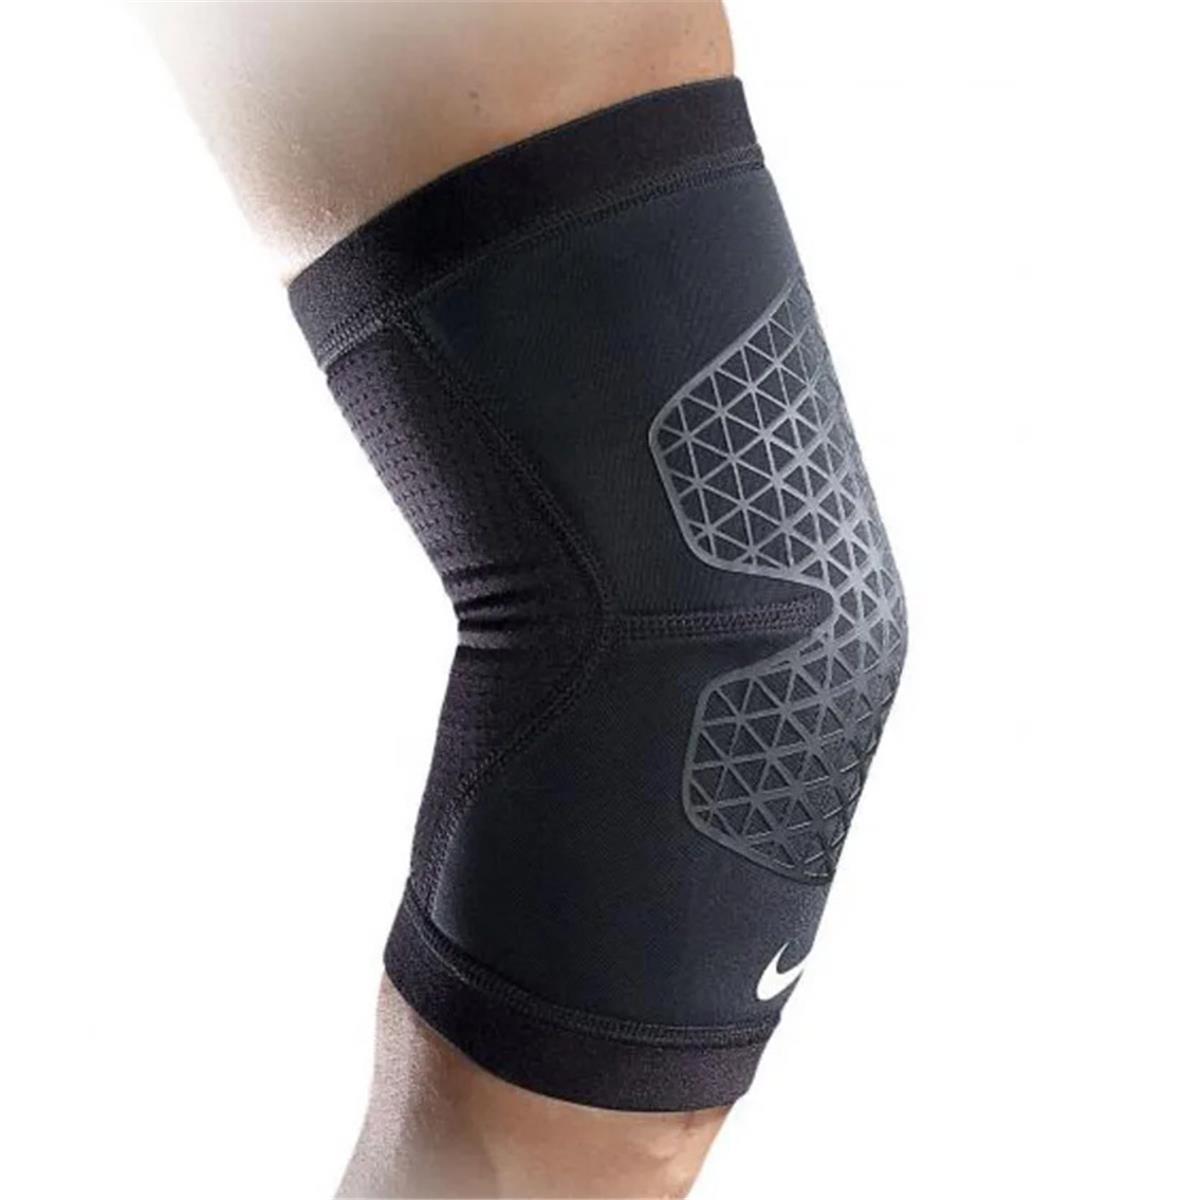 cheaper 4d987 378c3 Nike Pro Combat Elbow Sleeve (Black)  directsportseshop.co.u